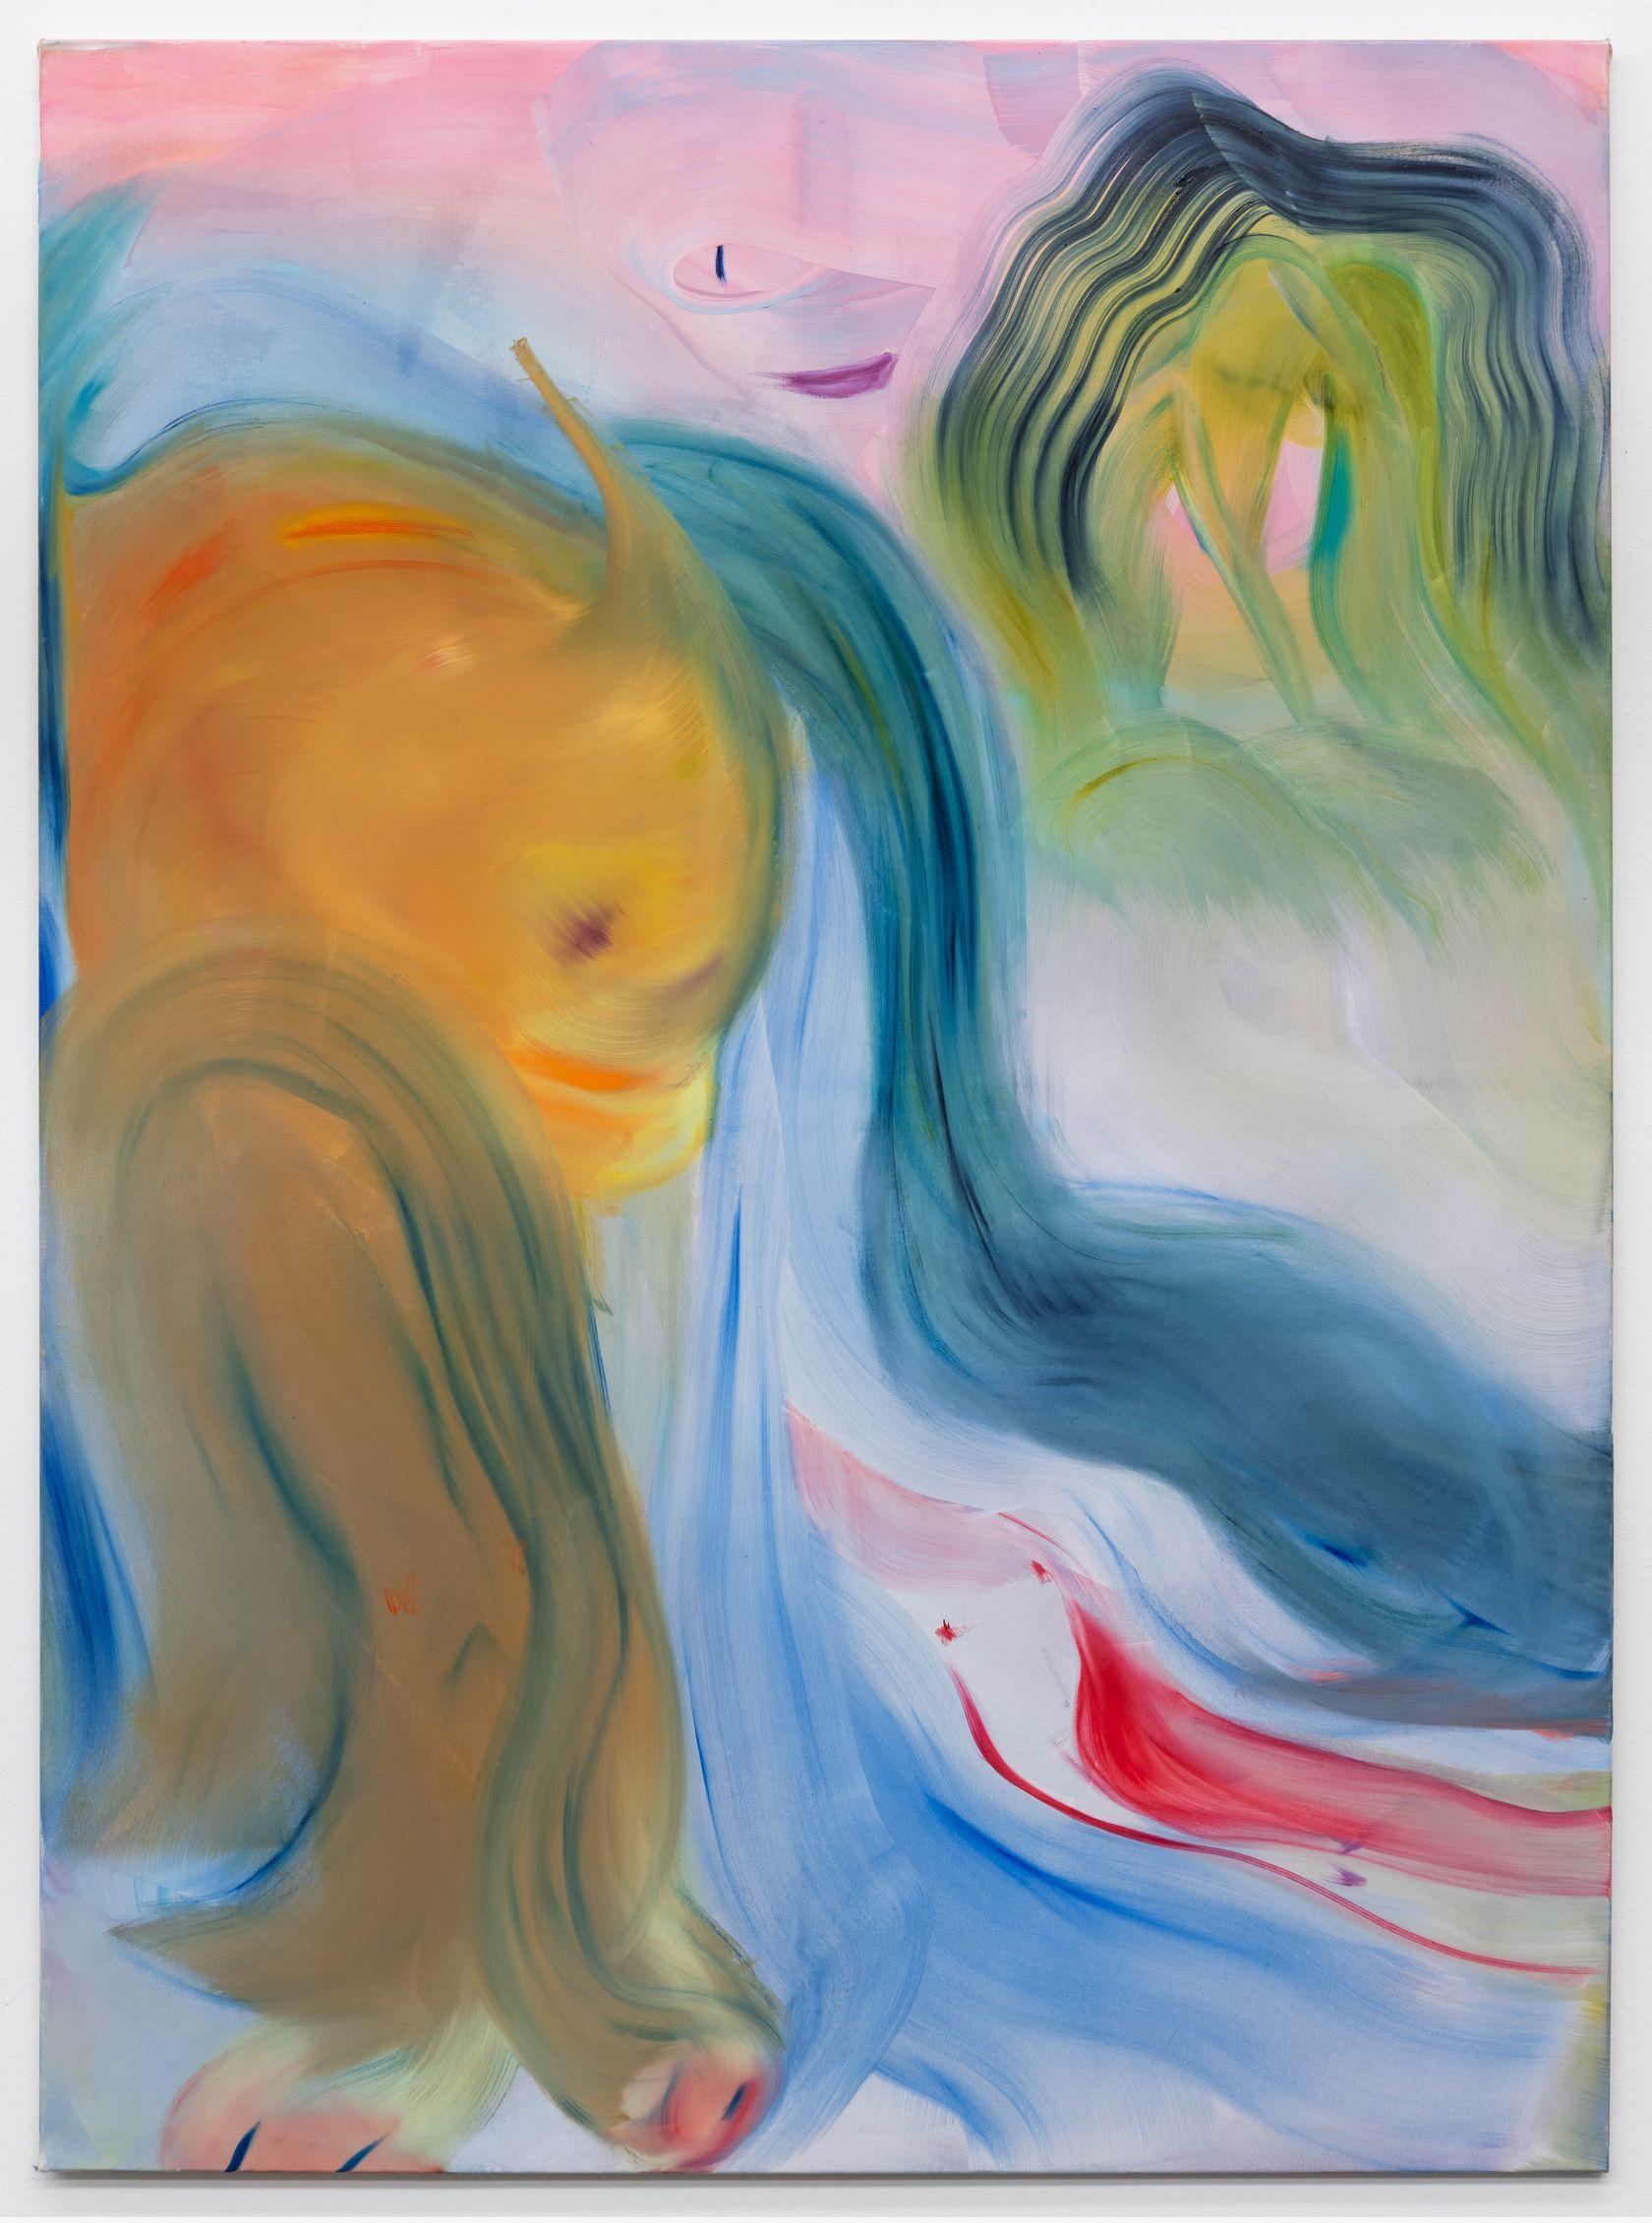 Aneta Kajzer, Waterfalls, 2021 Huile sur toile190 × 140 cm / 74 6/8 × 55 1/8 in.